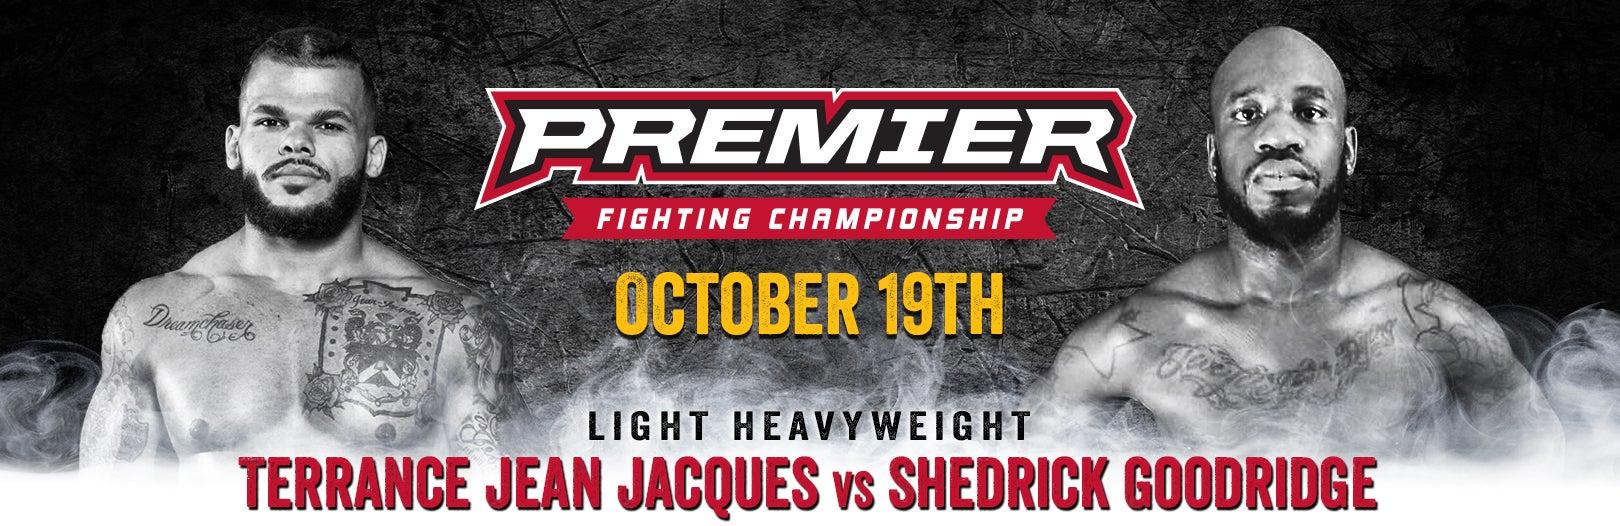 Premier Fighting Championship